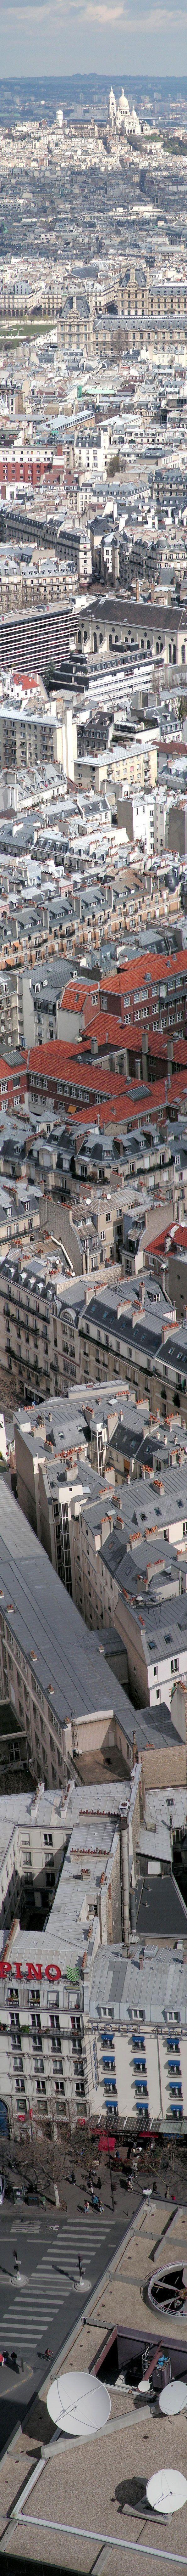 Great shot of Paris • original source not found